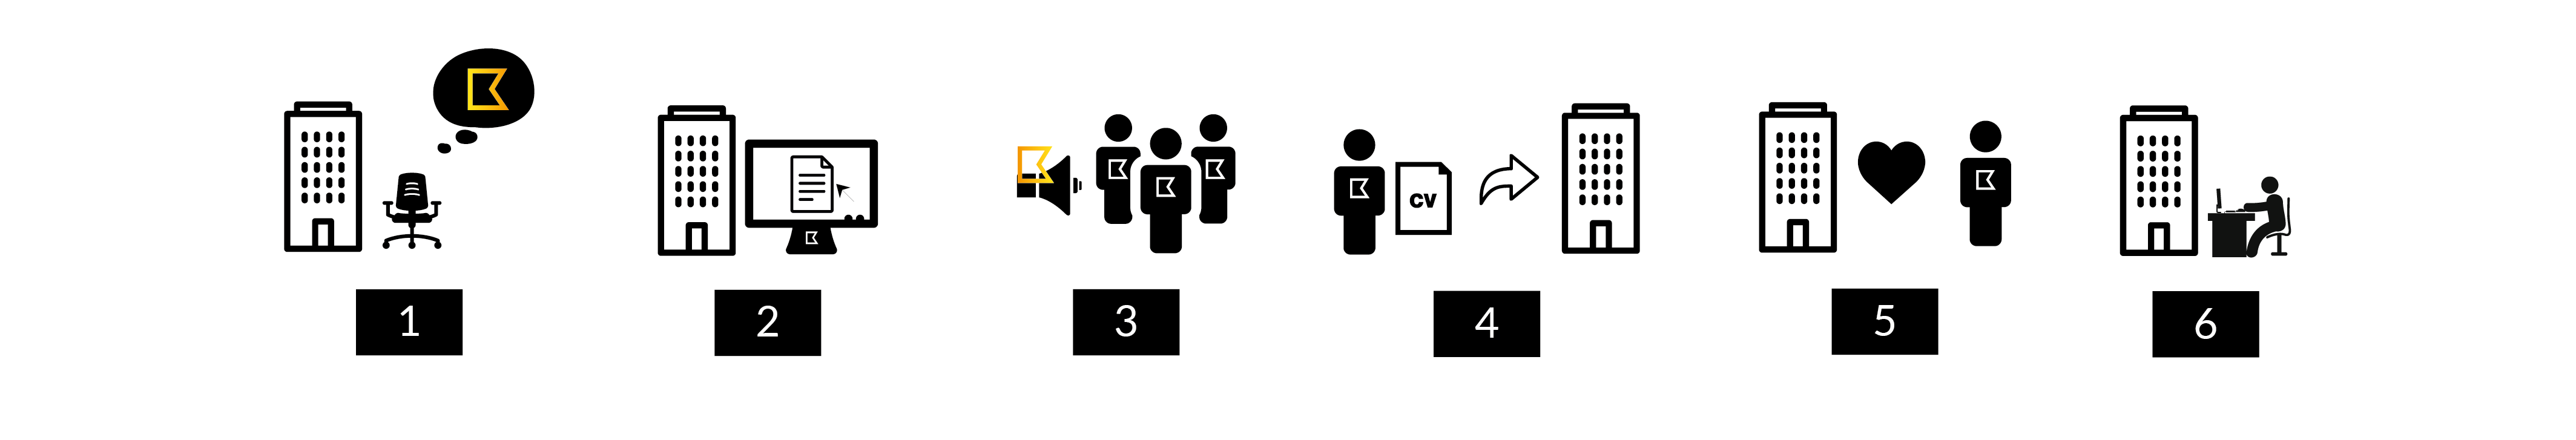 procedimiento kschool empleo-02-01